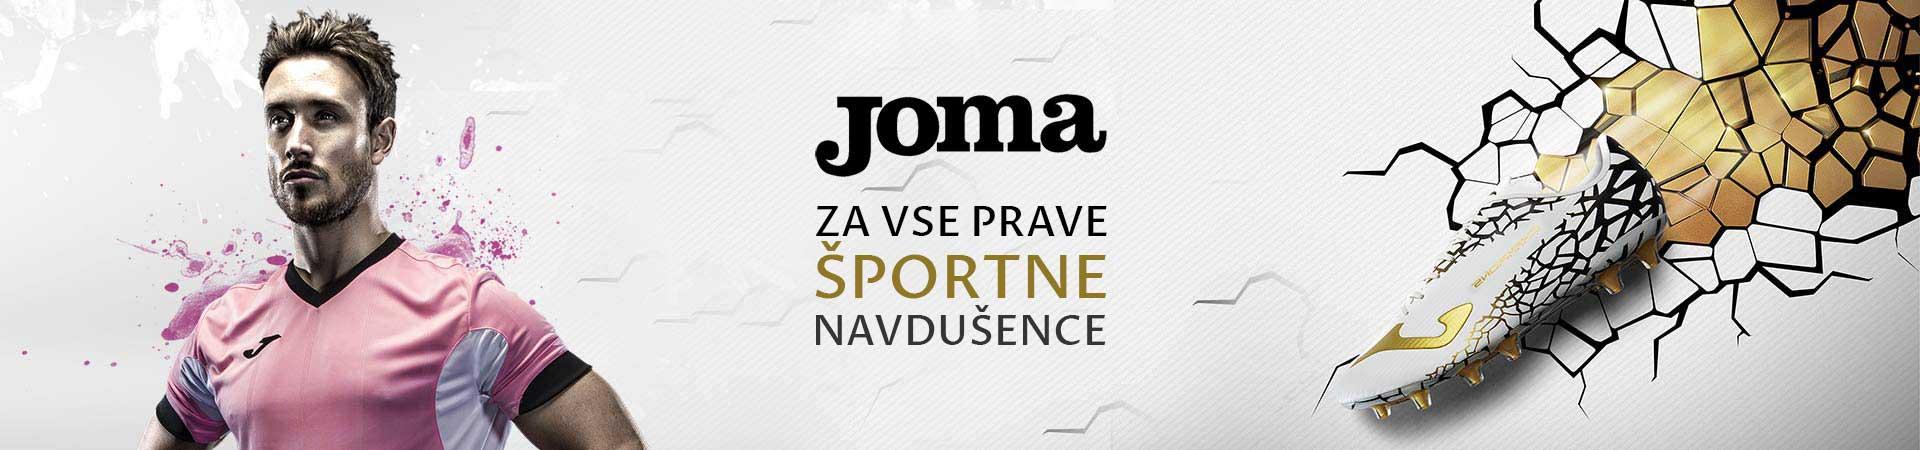 pasica-joma2